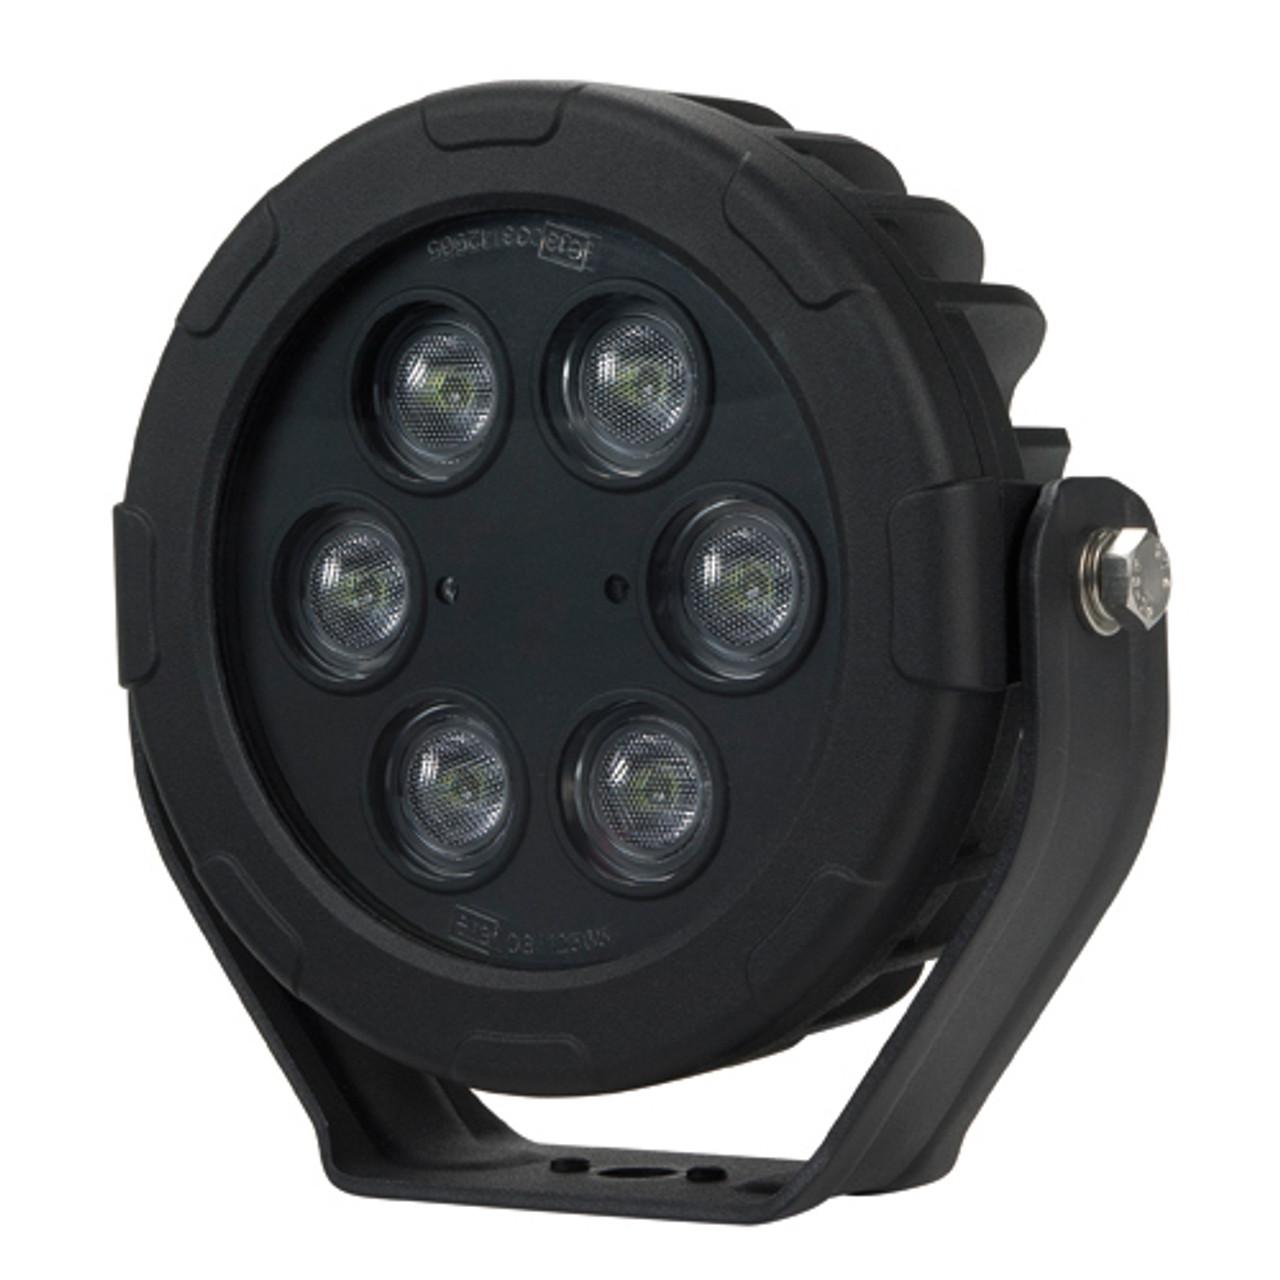 Work Light Flood Beam. 180 mm Round. LED60F. 48 Watt. Submersible Water Rating: IP68. Submersible to 3 Metres